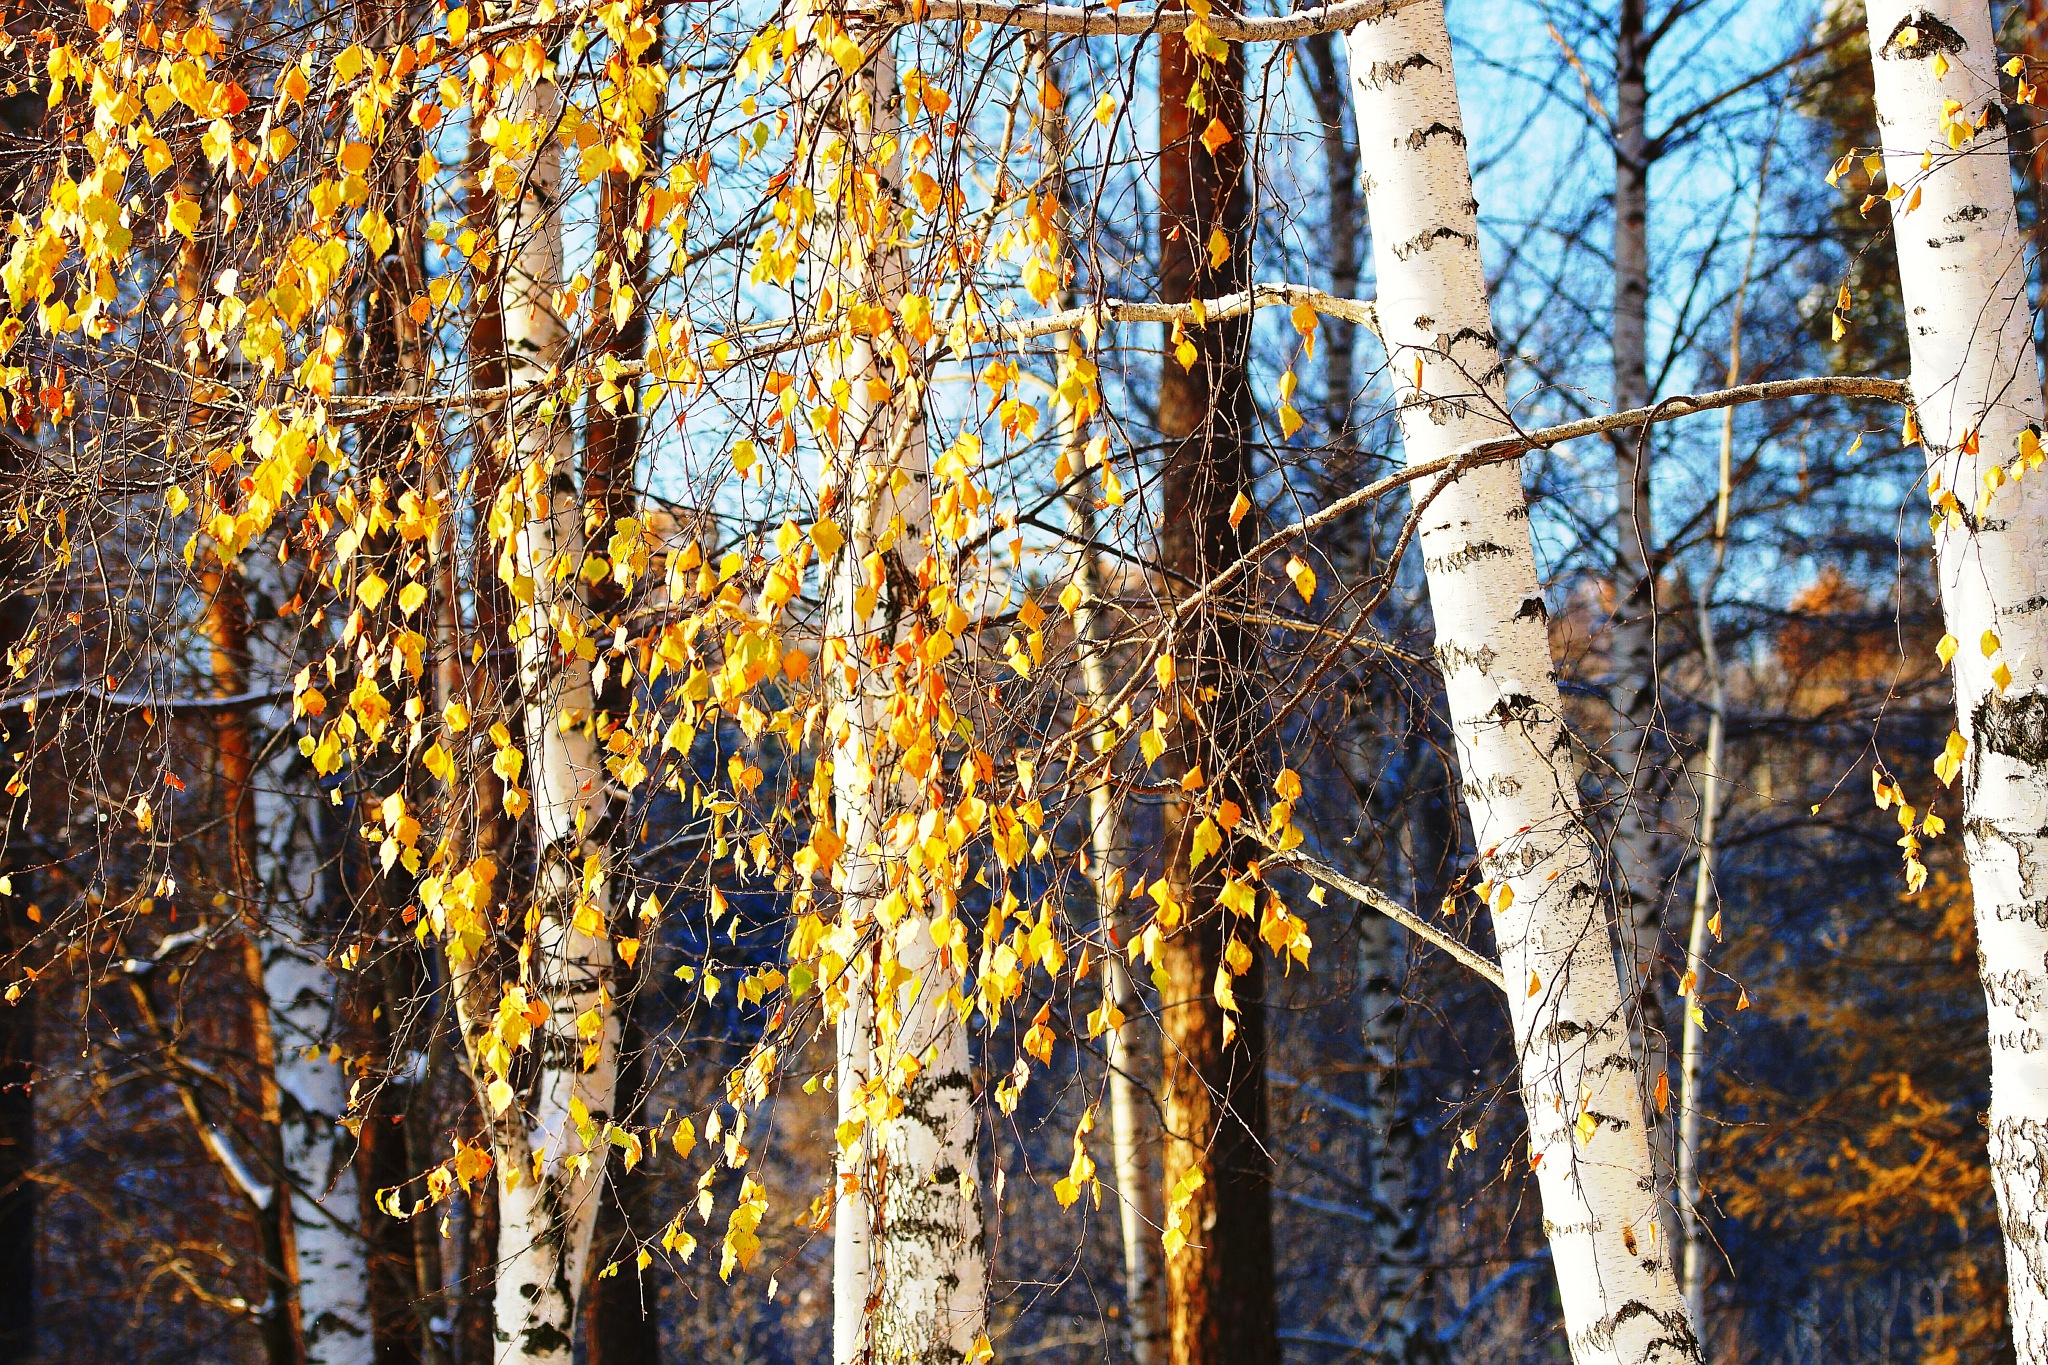 Yellow leaves of November by sergey.parfeniuk